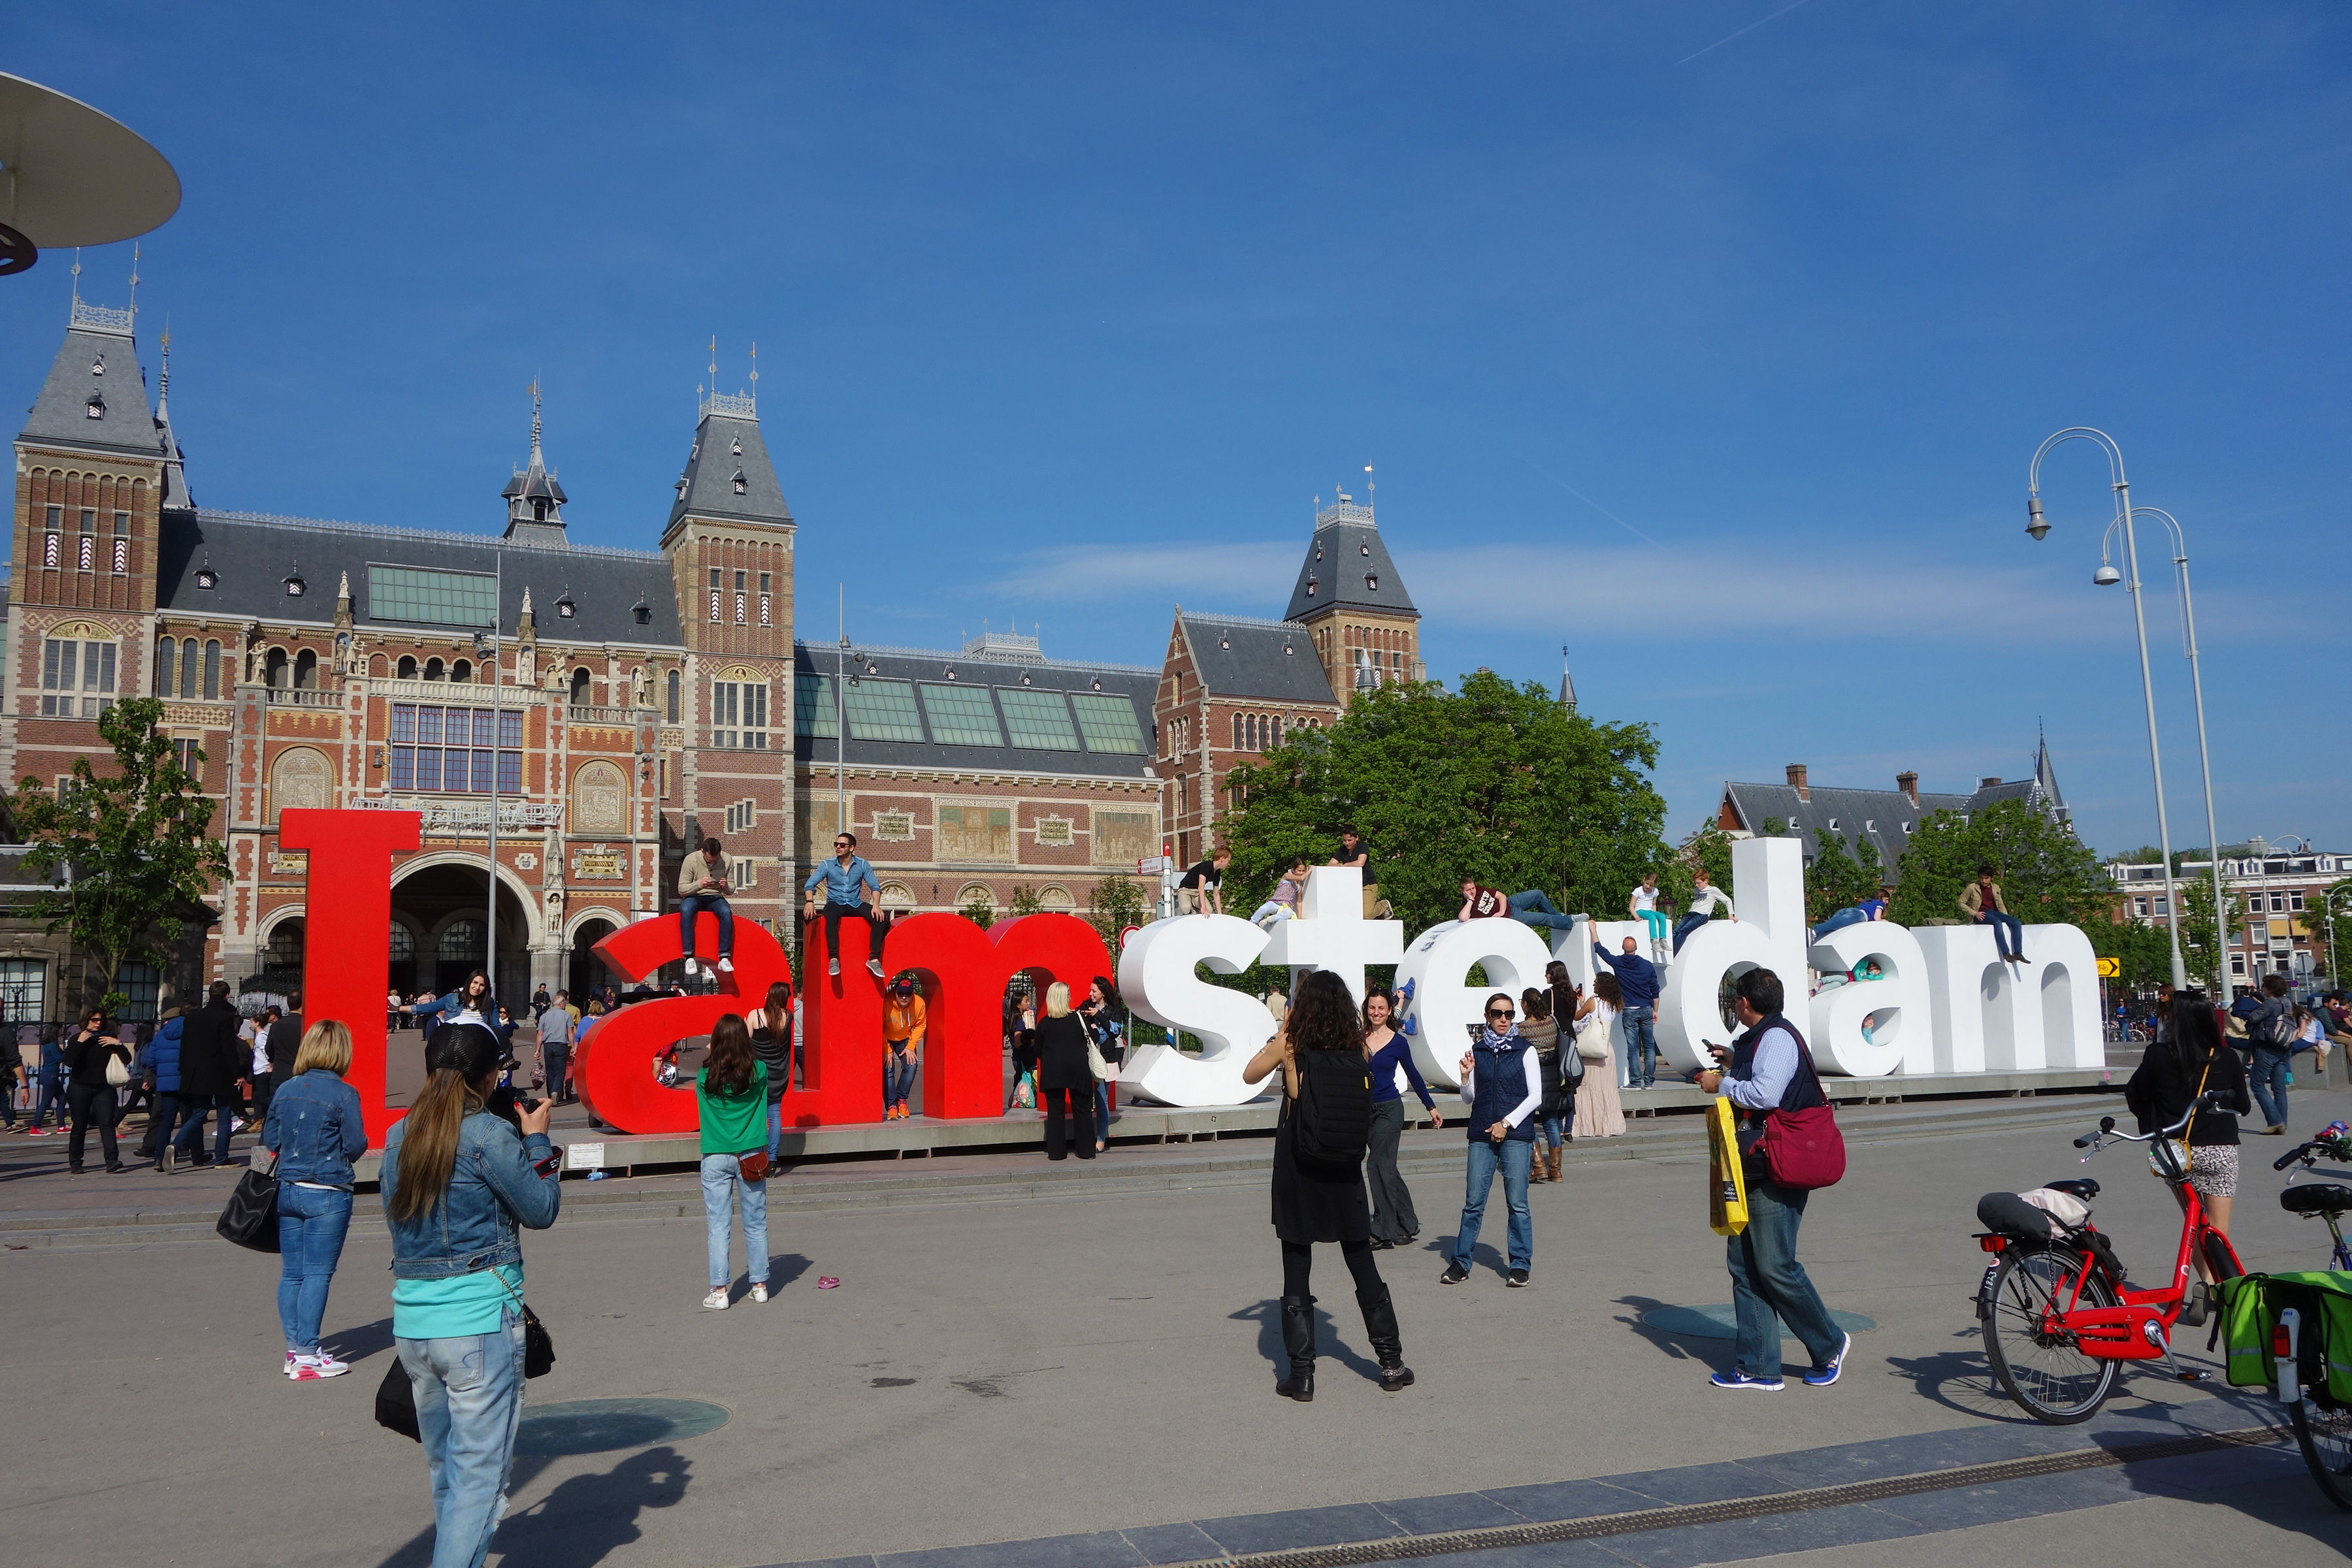 amsterdam europe - Image